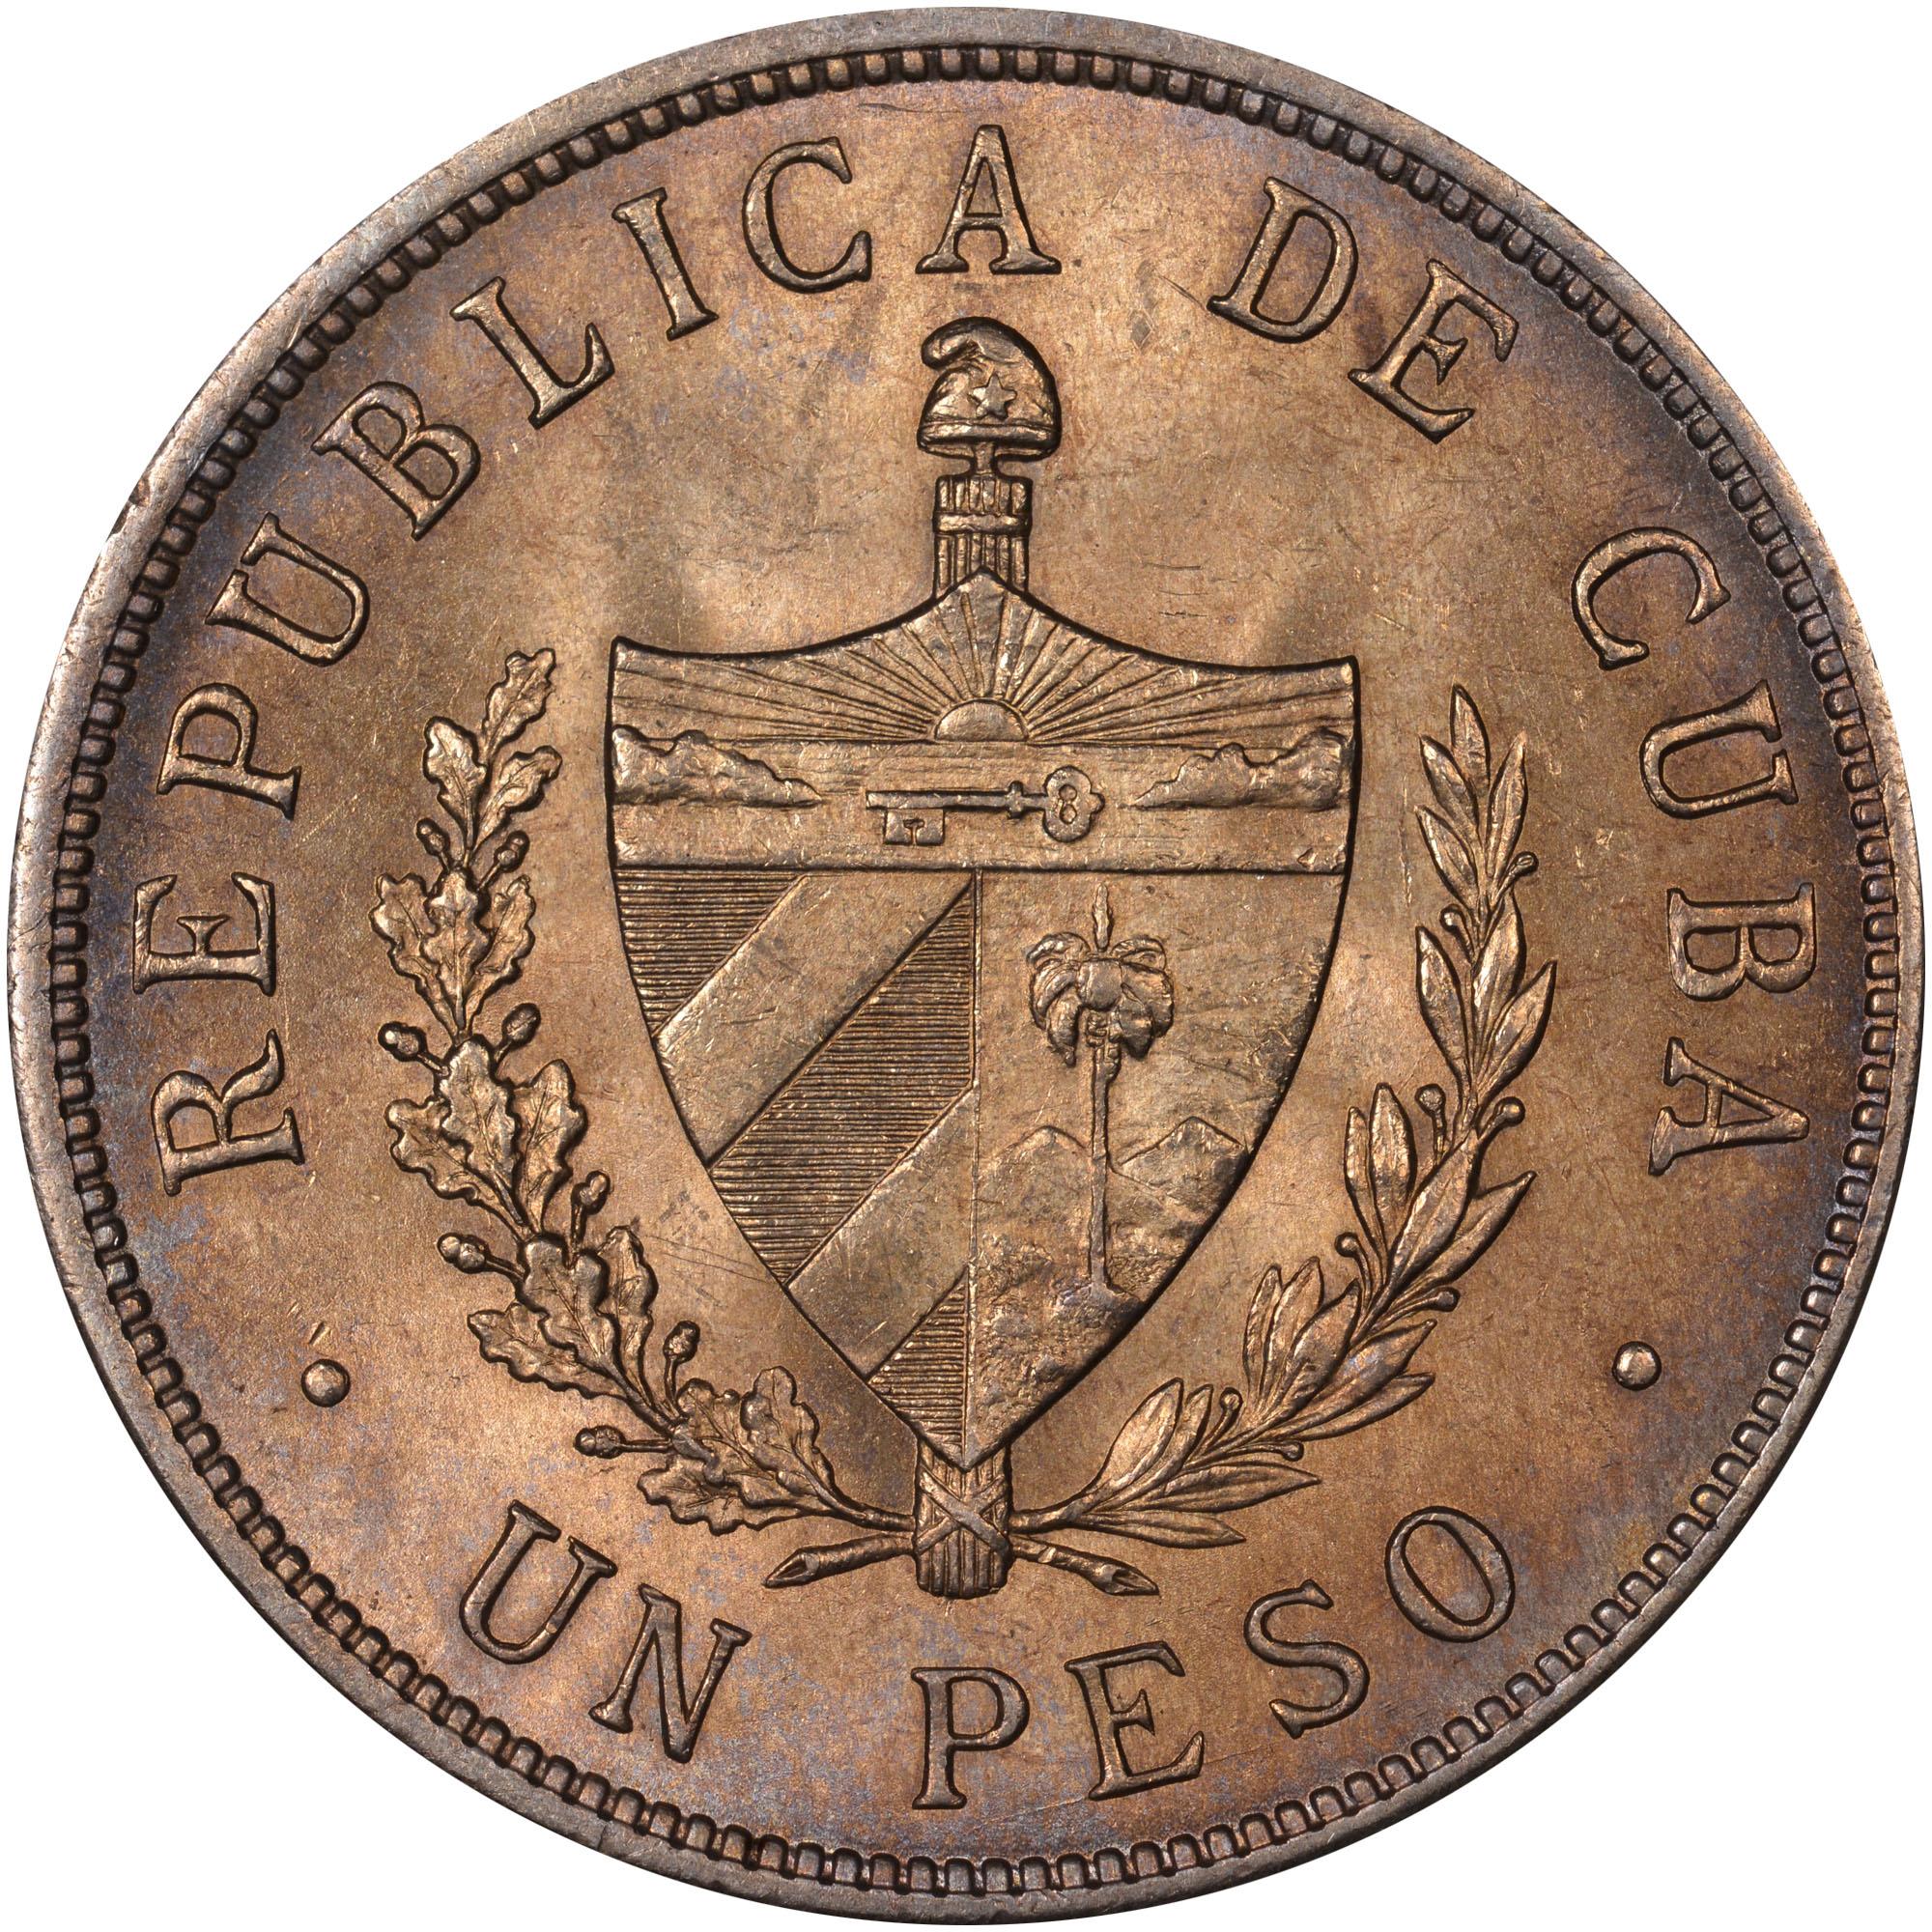 1915-1934 Cuba Peso obverse